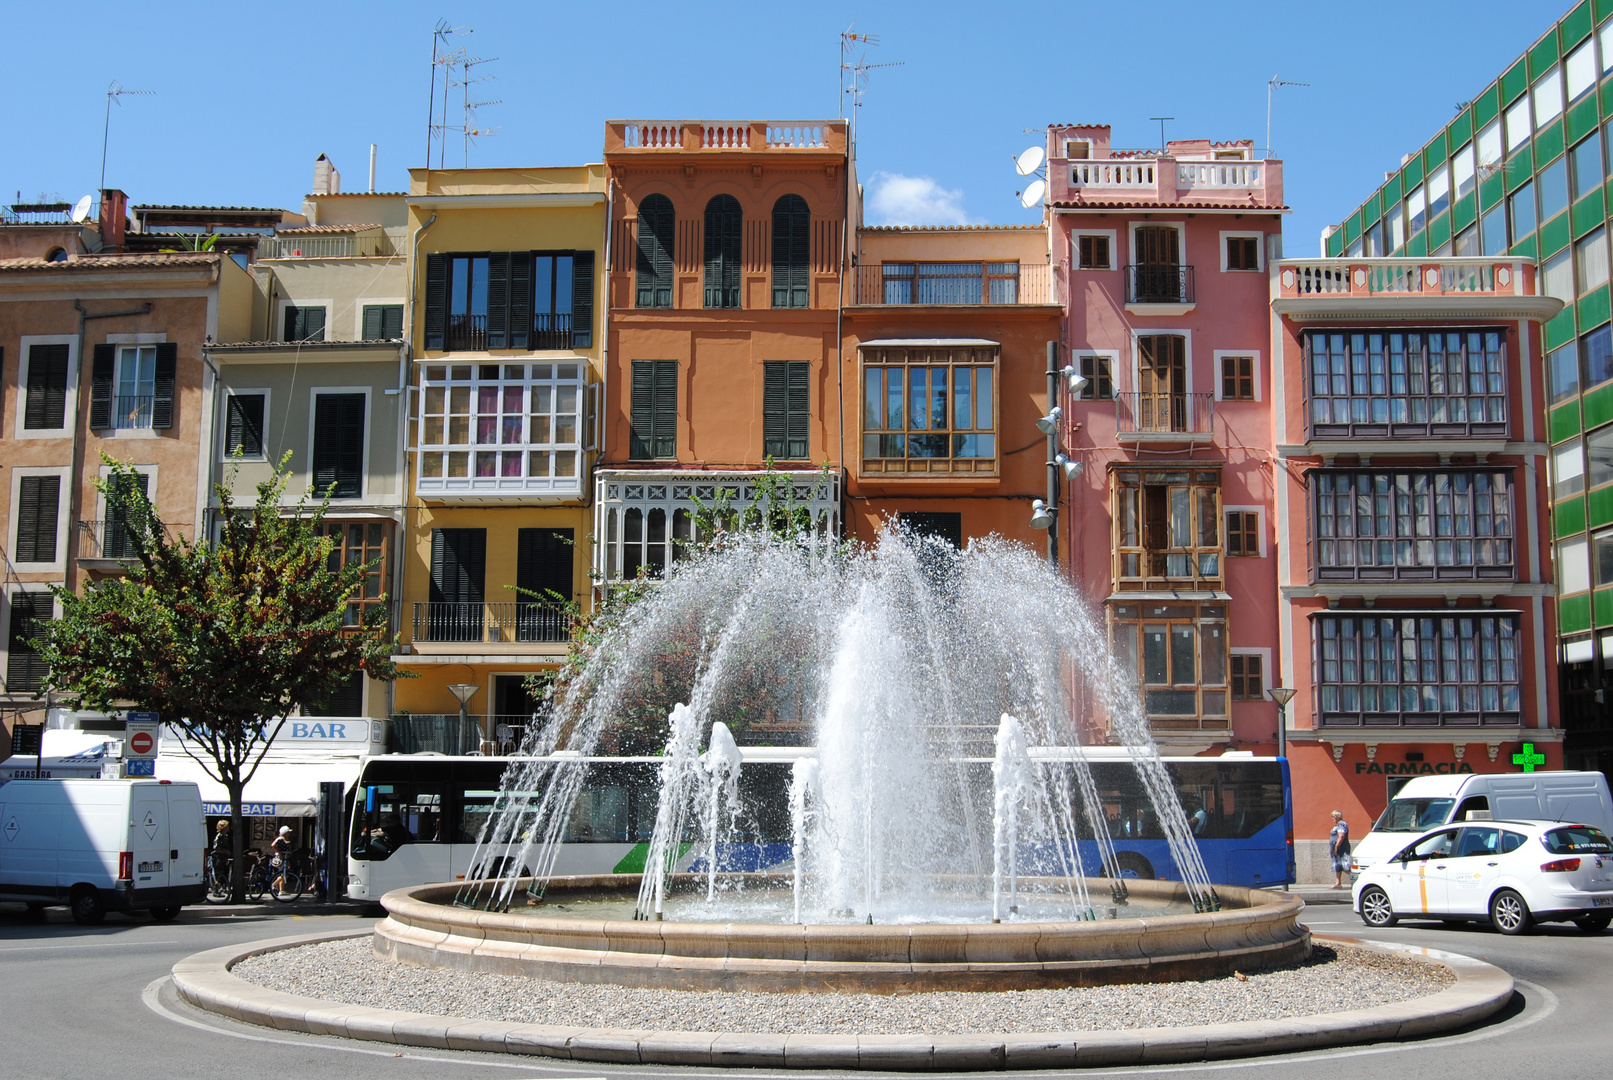 Brunnen auf Mallorca